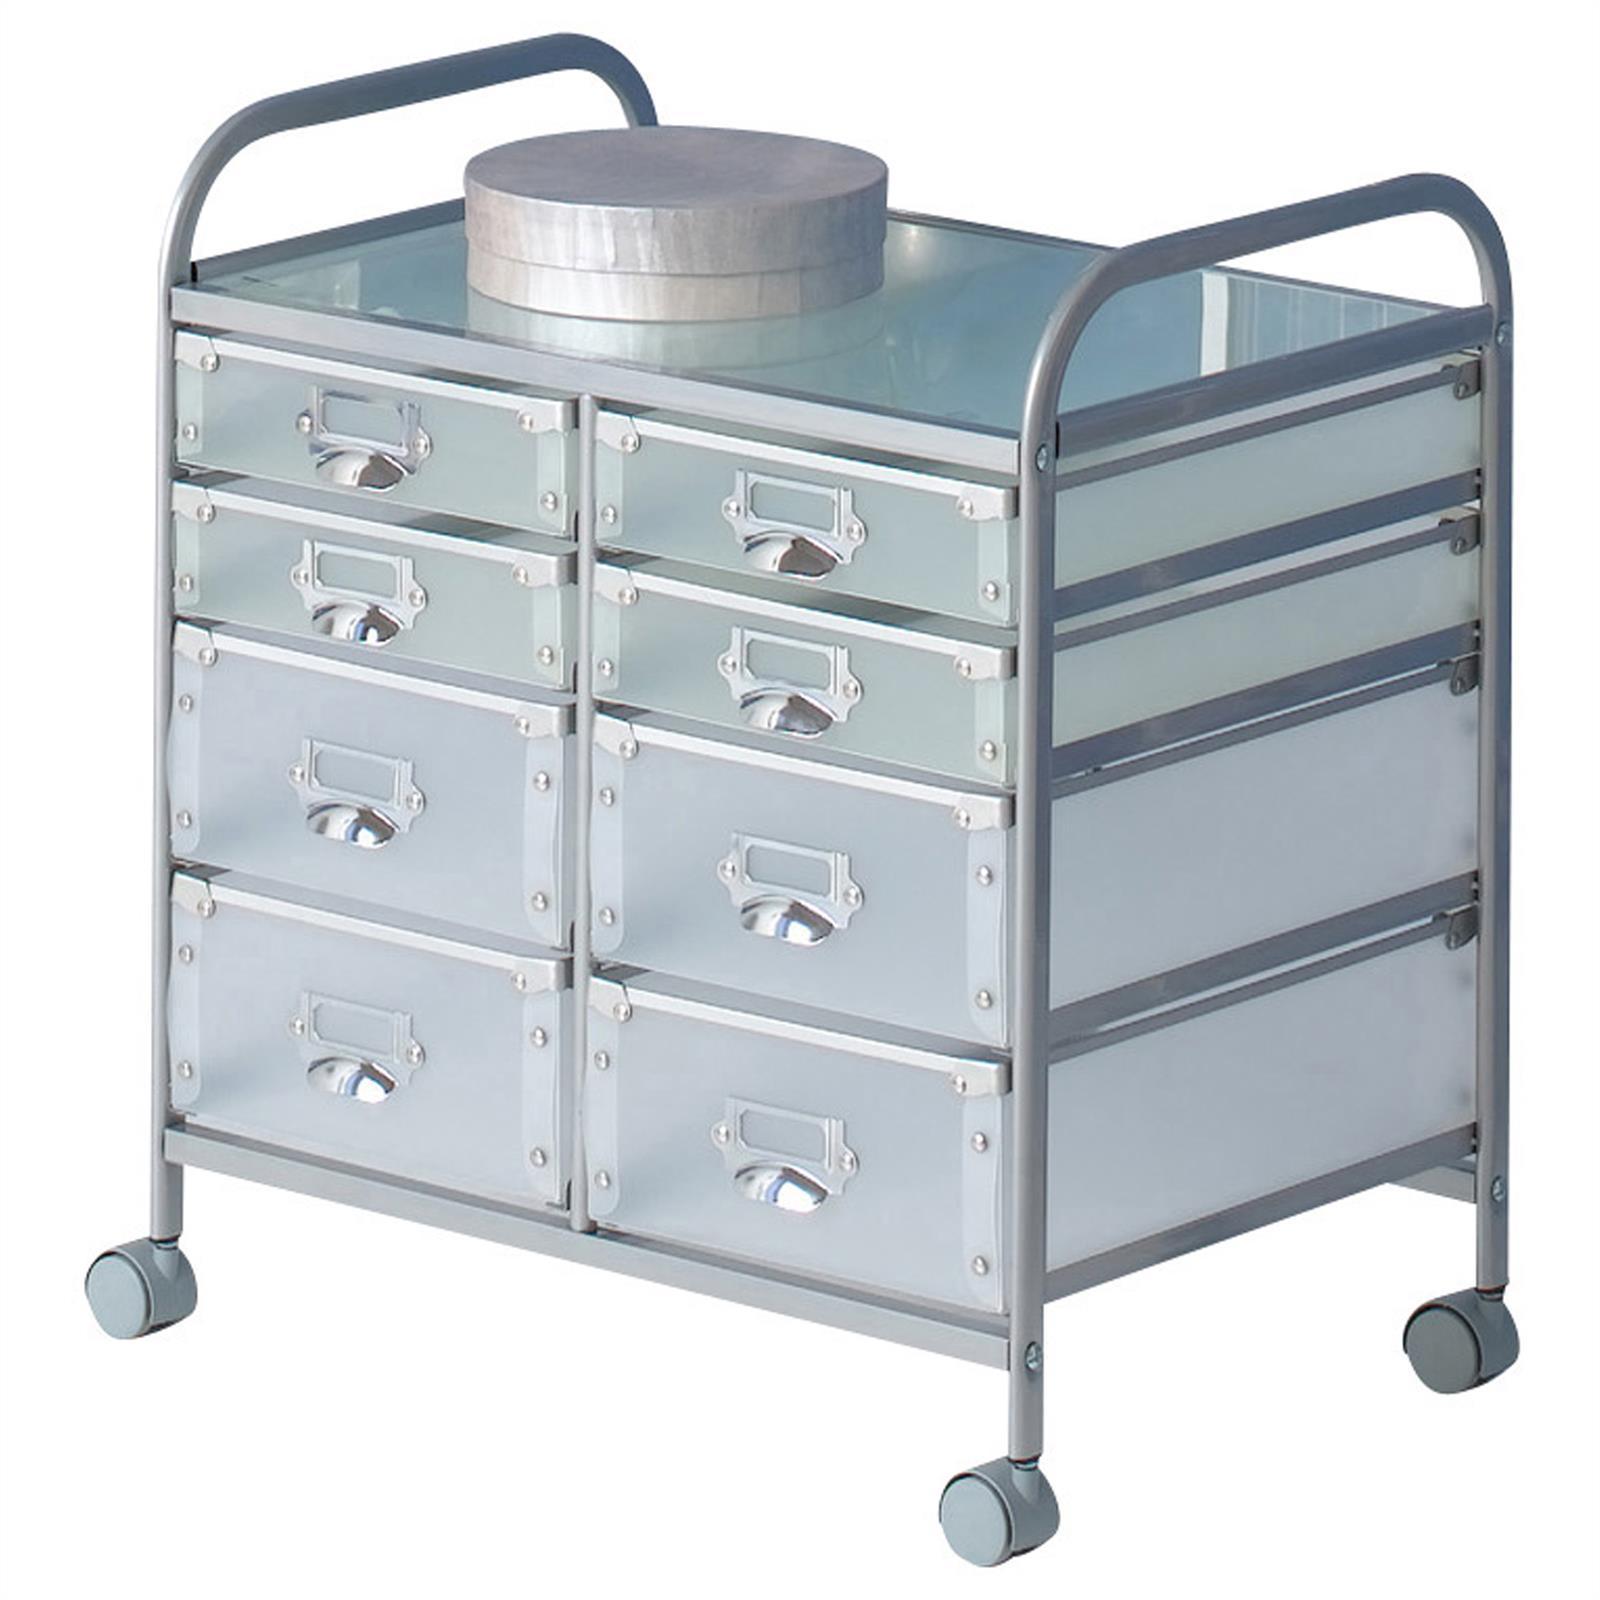 rollcontainer roli mit 8 schubladen mobilia24. Black Bedroom Furniture Sets. Home Design Ideas